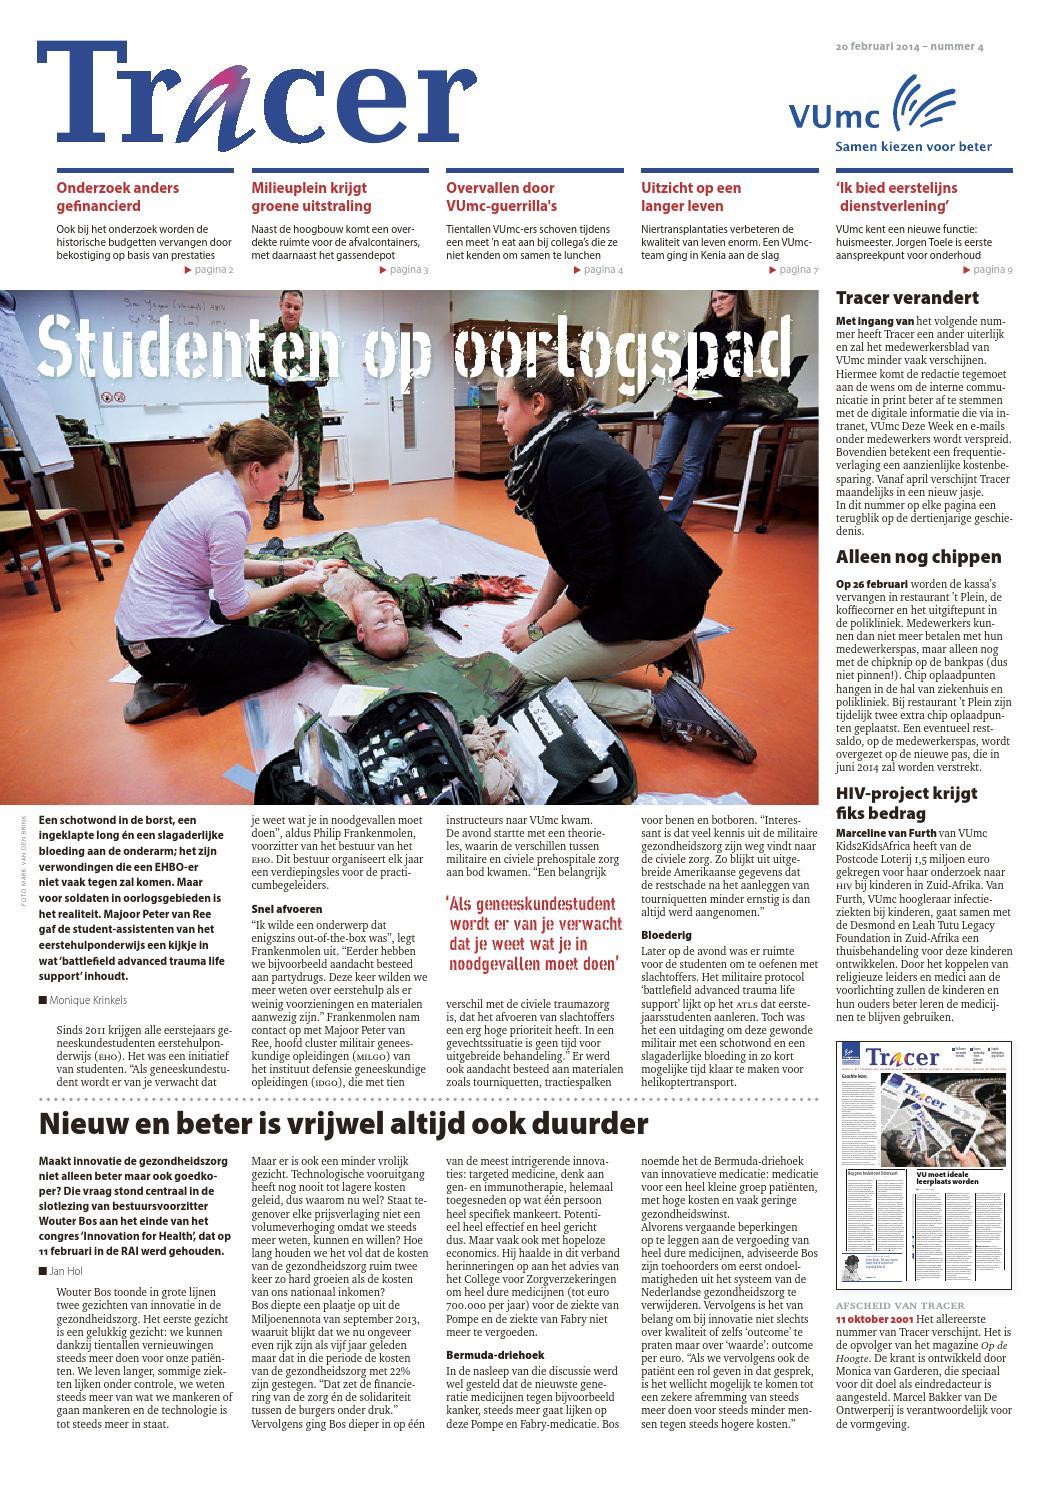 4860cb0ea26 Tracer 4, 2014 by VUmc / VU University Medical Center Amsterdam - issuu